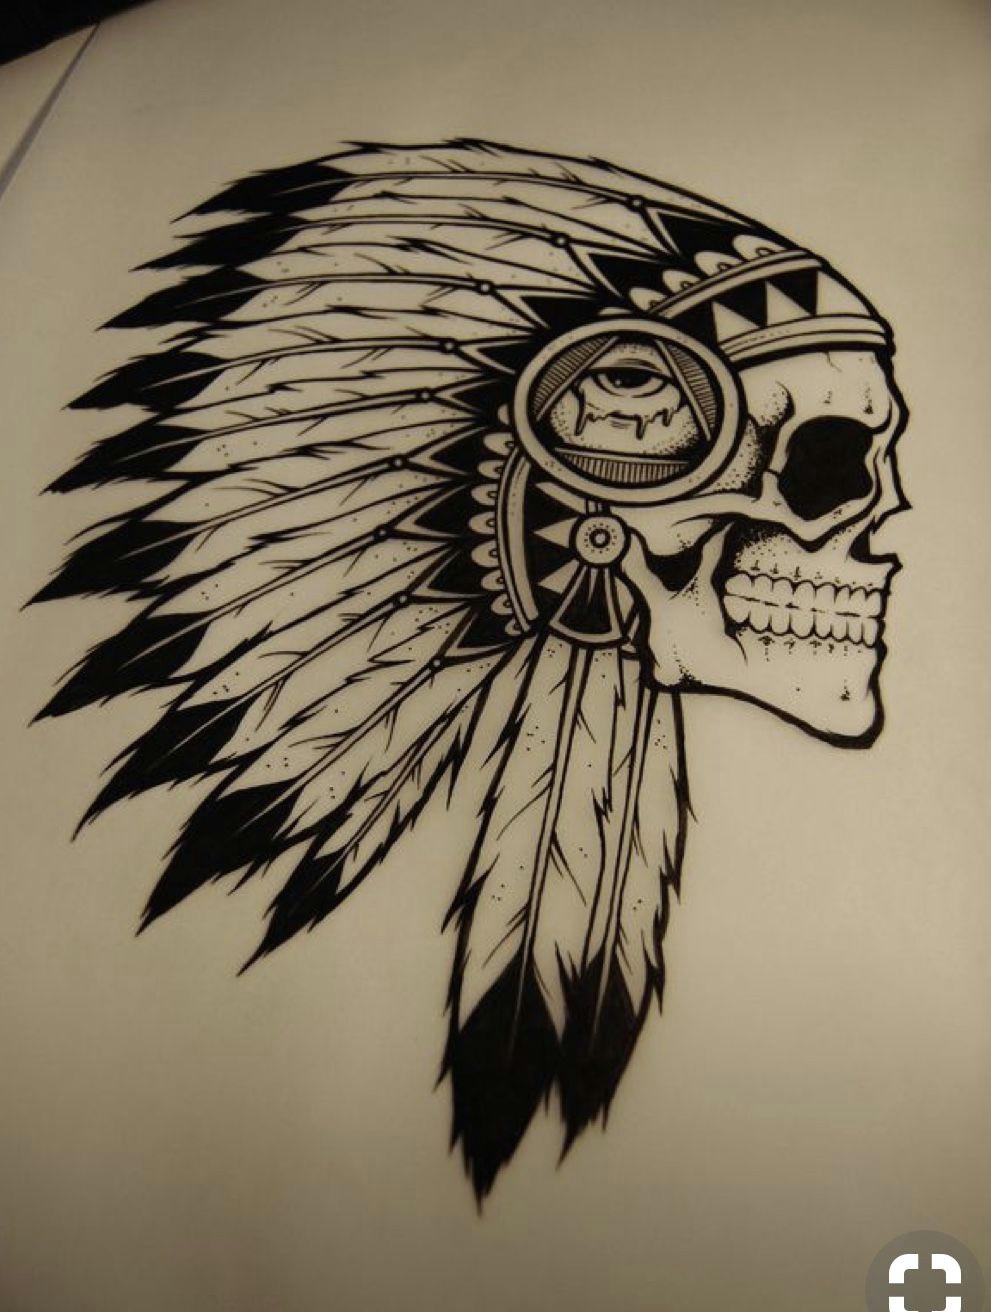 indian chief tattoo indian skull tattoos tattoo sketches tattoo drawings wolf drawings